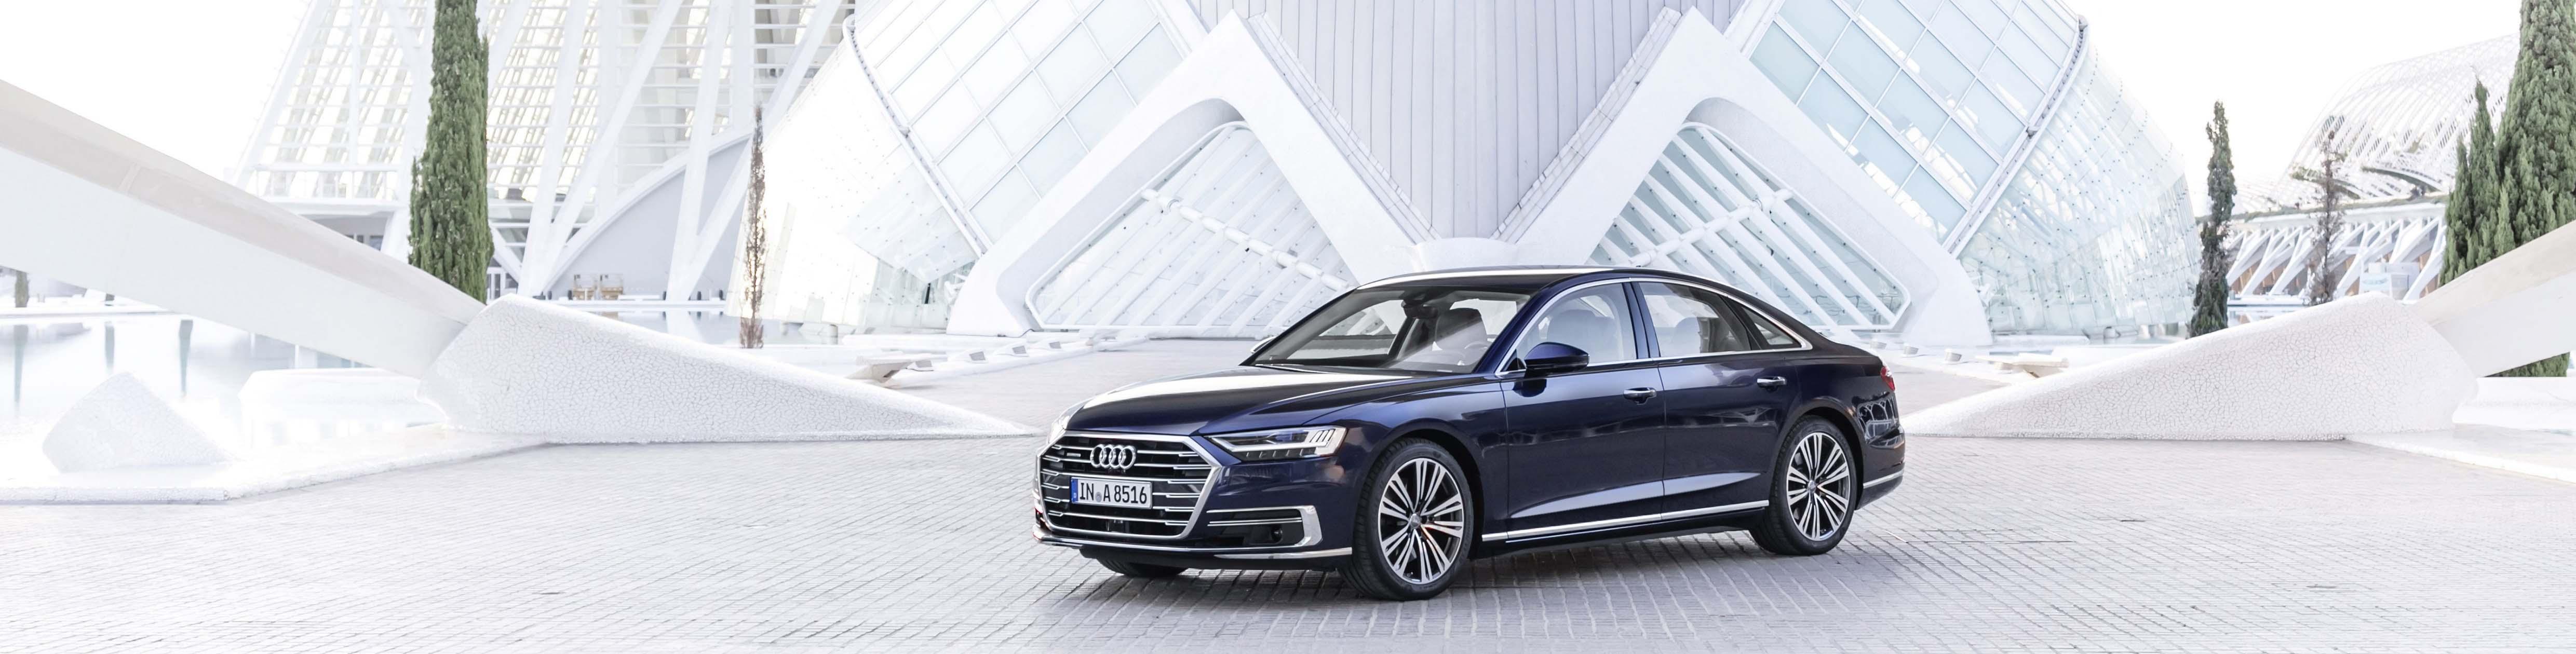 Offerte Audi A8